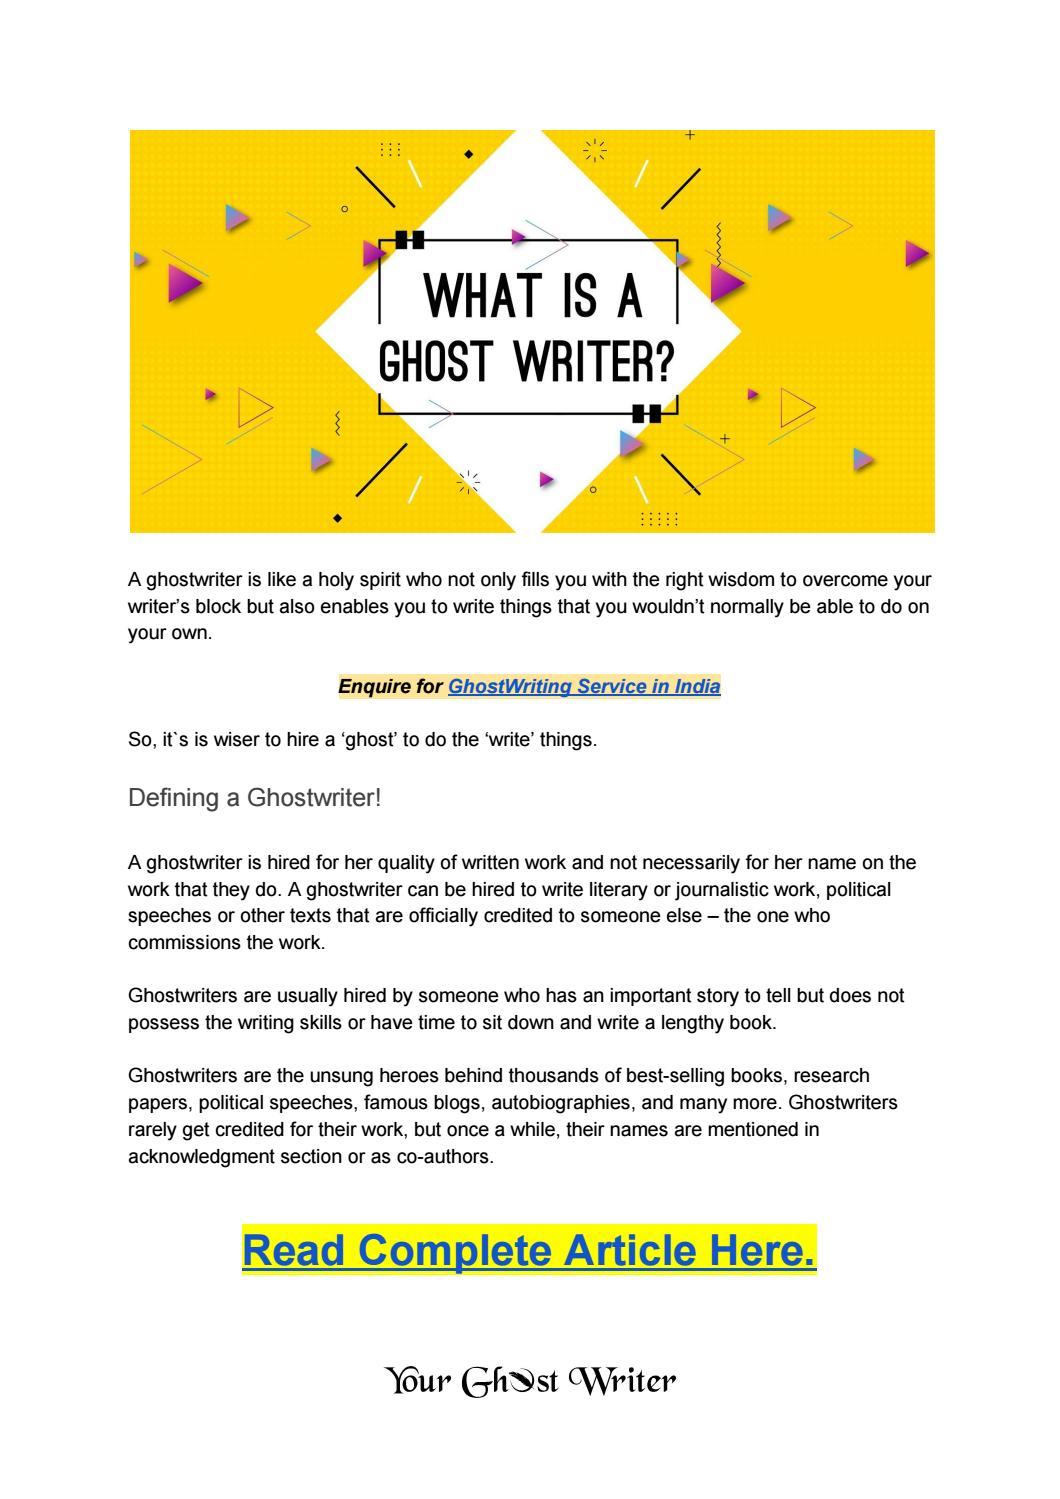 Literature ghostwriting for hire best home work editor website online